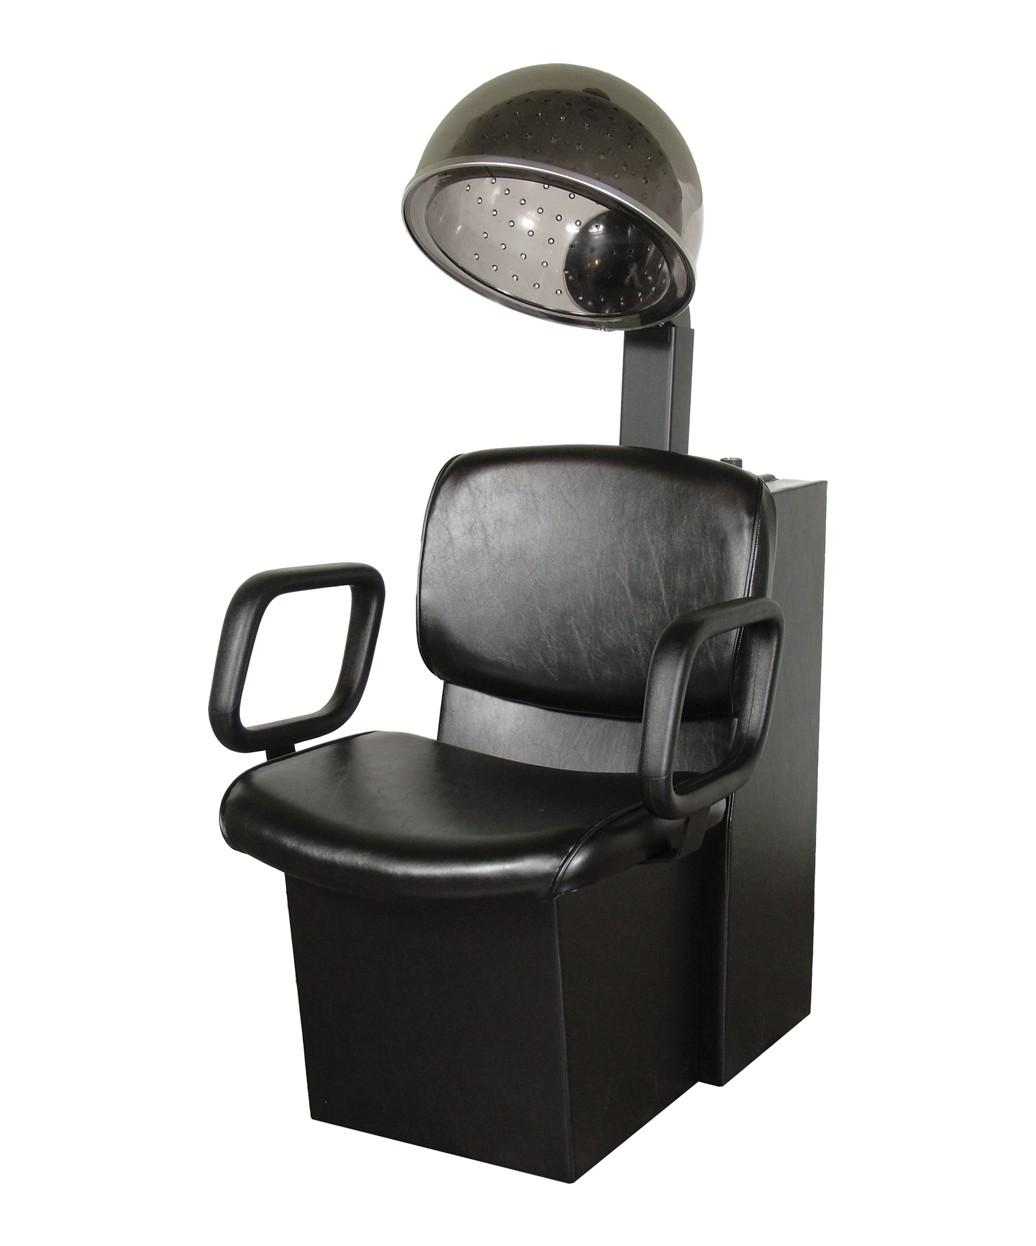 dryer chairs salon seafoam green chair collins 1820 qse